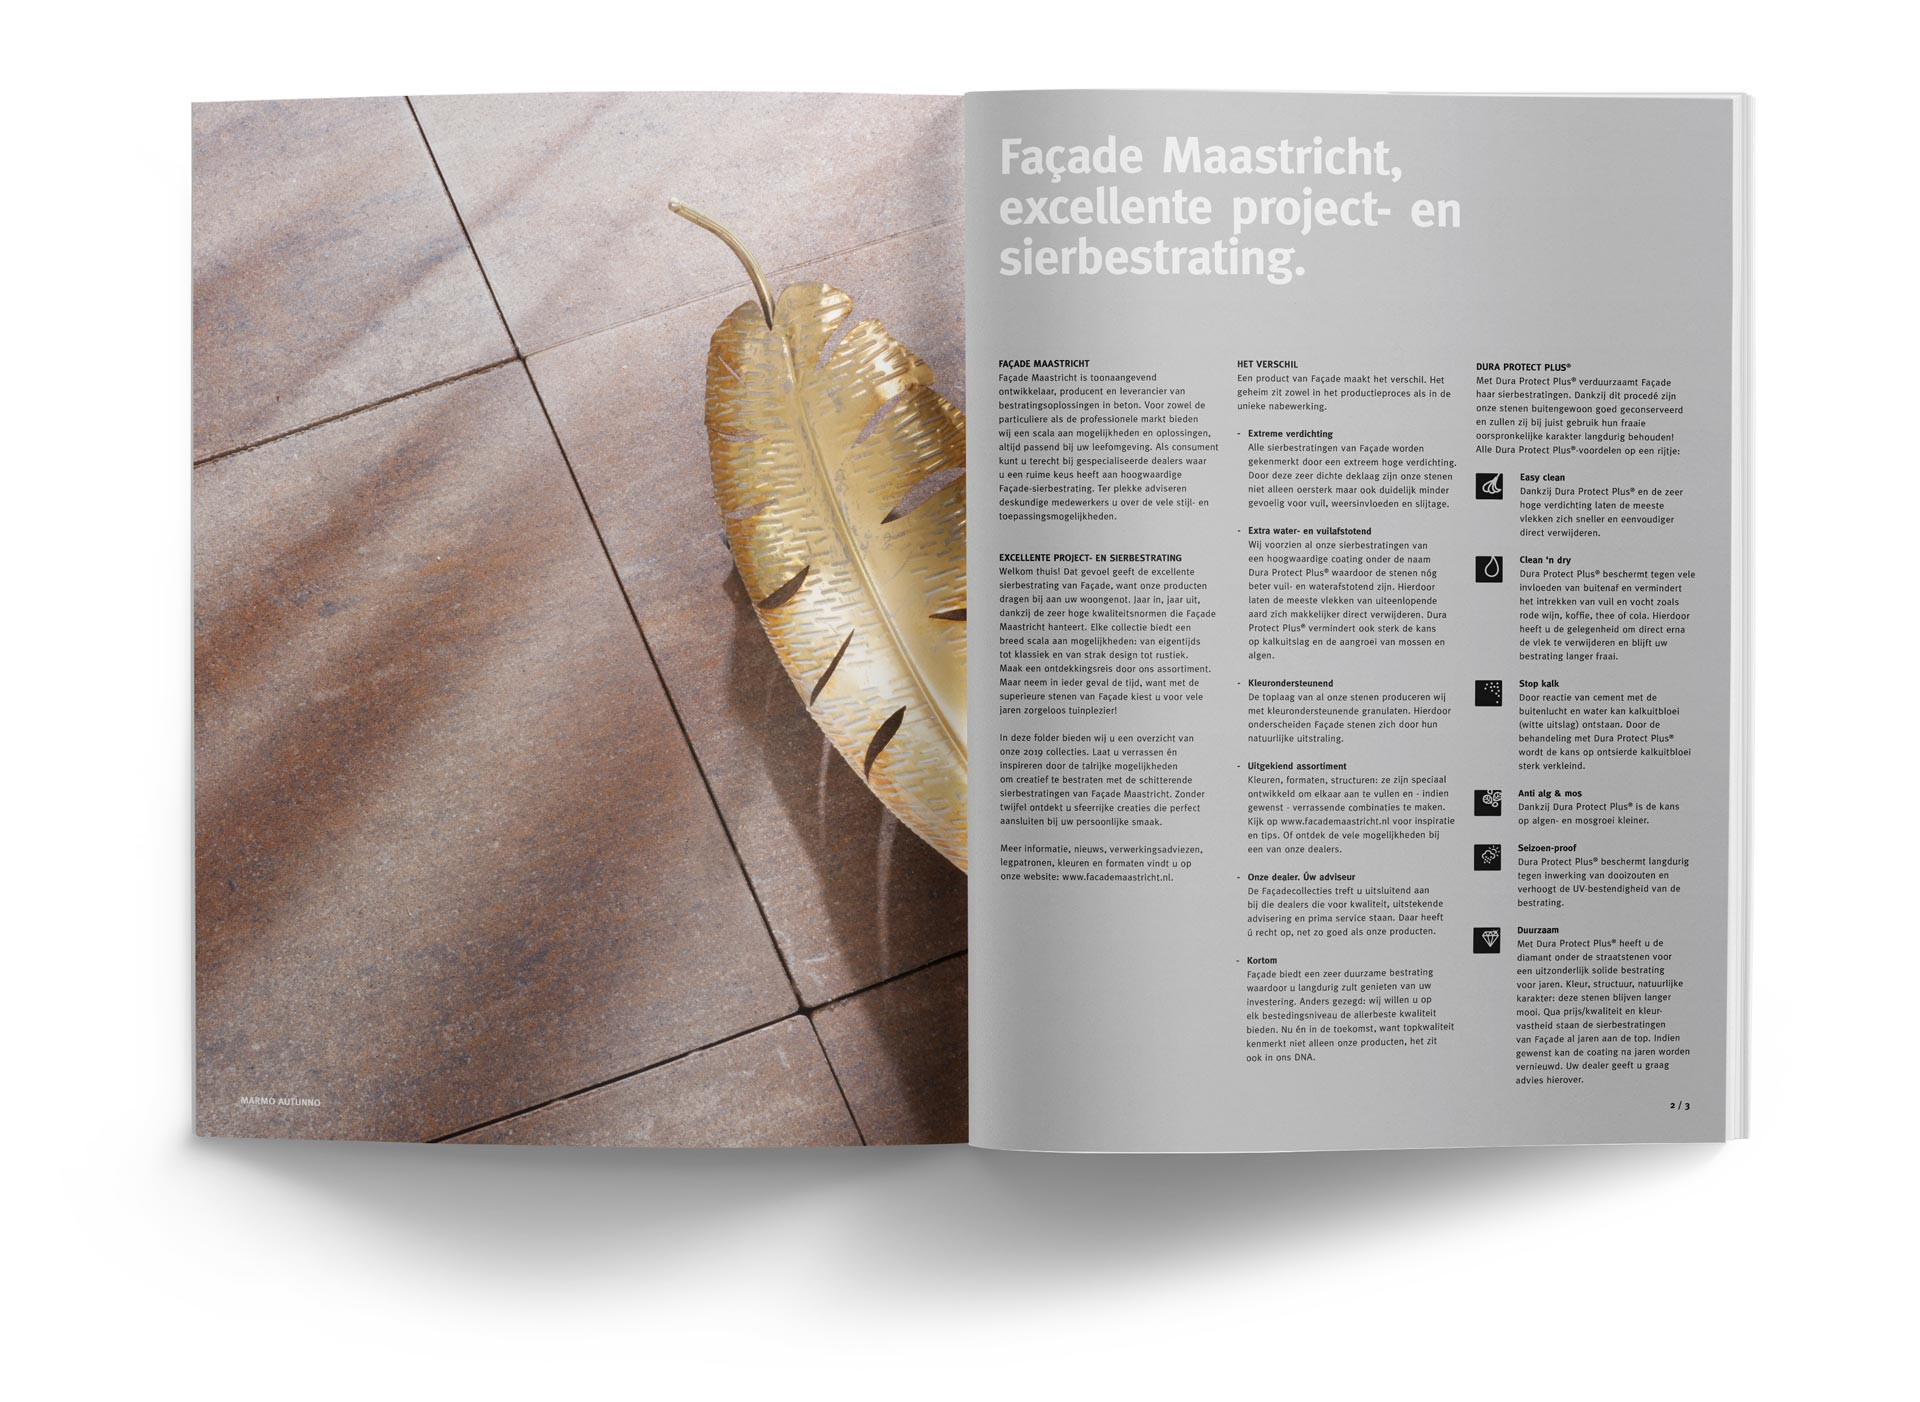 FORMARIS-FACADE-MAASTRICHT-BROCHURE-01.j